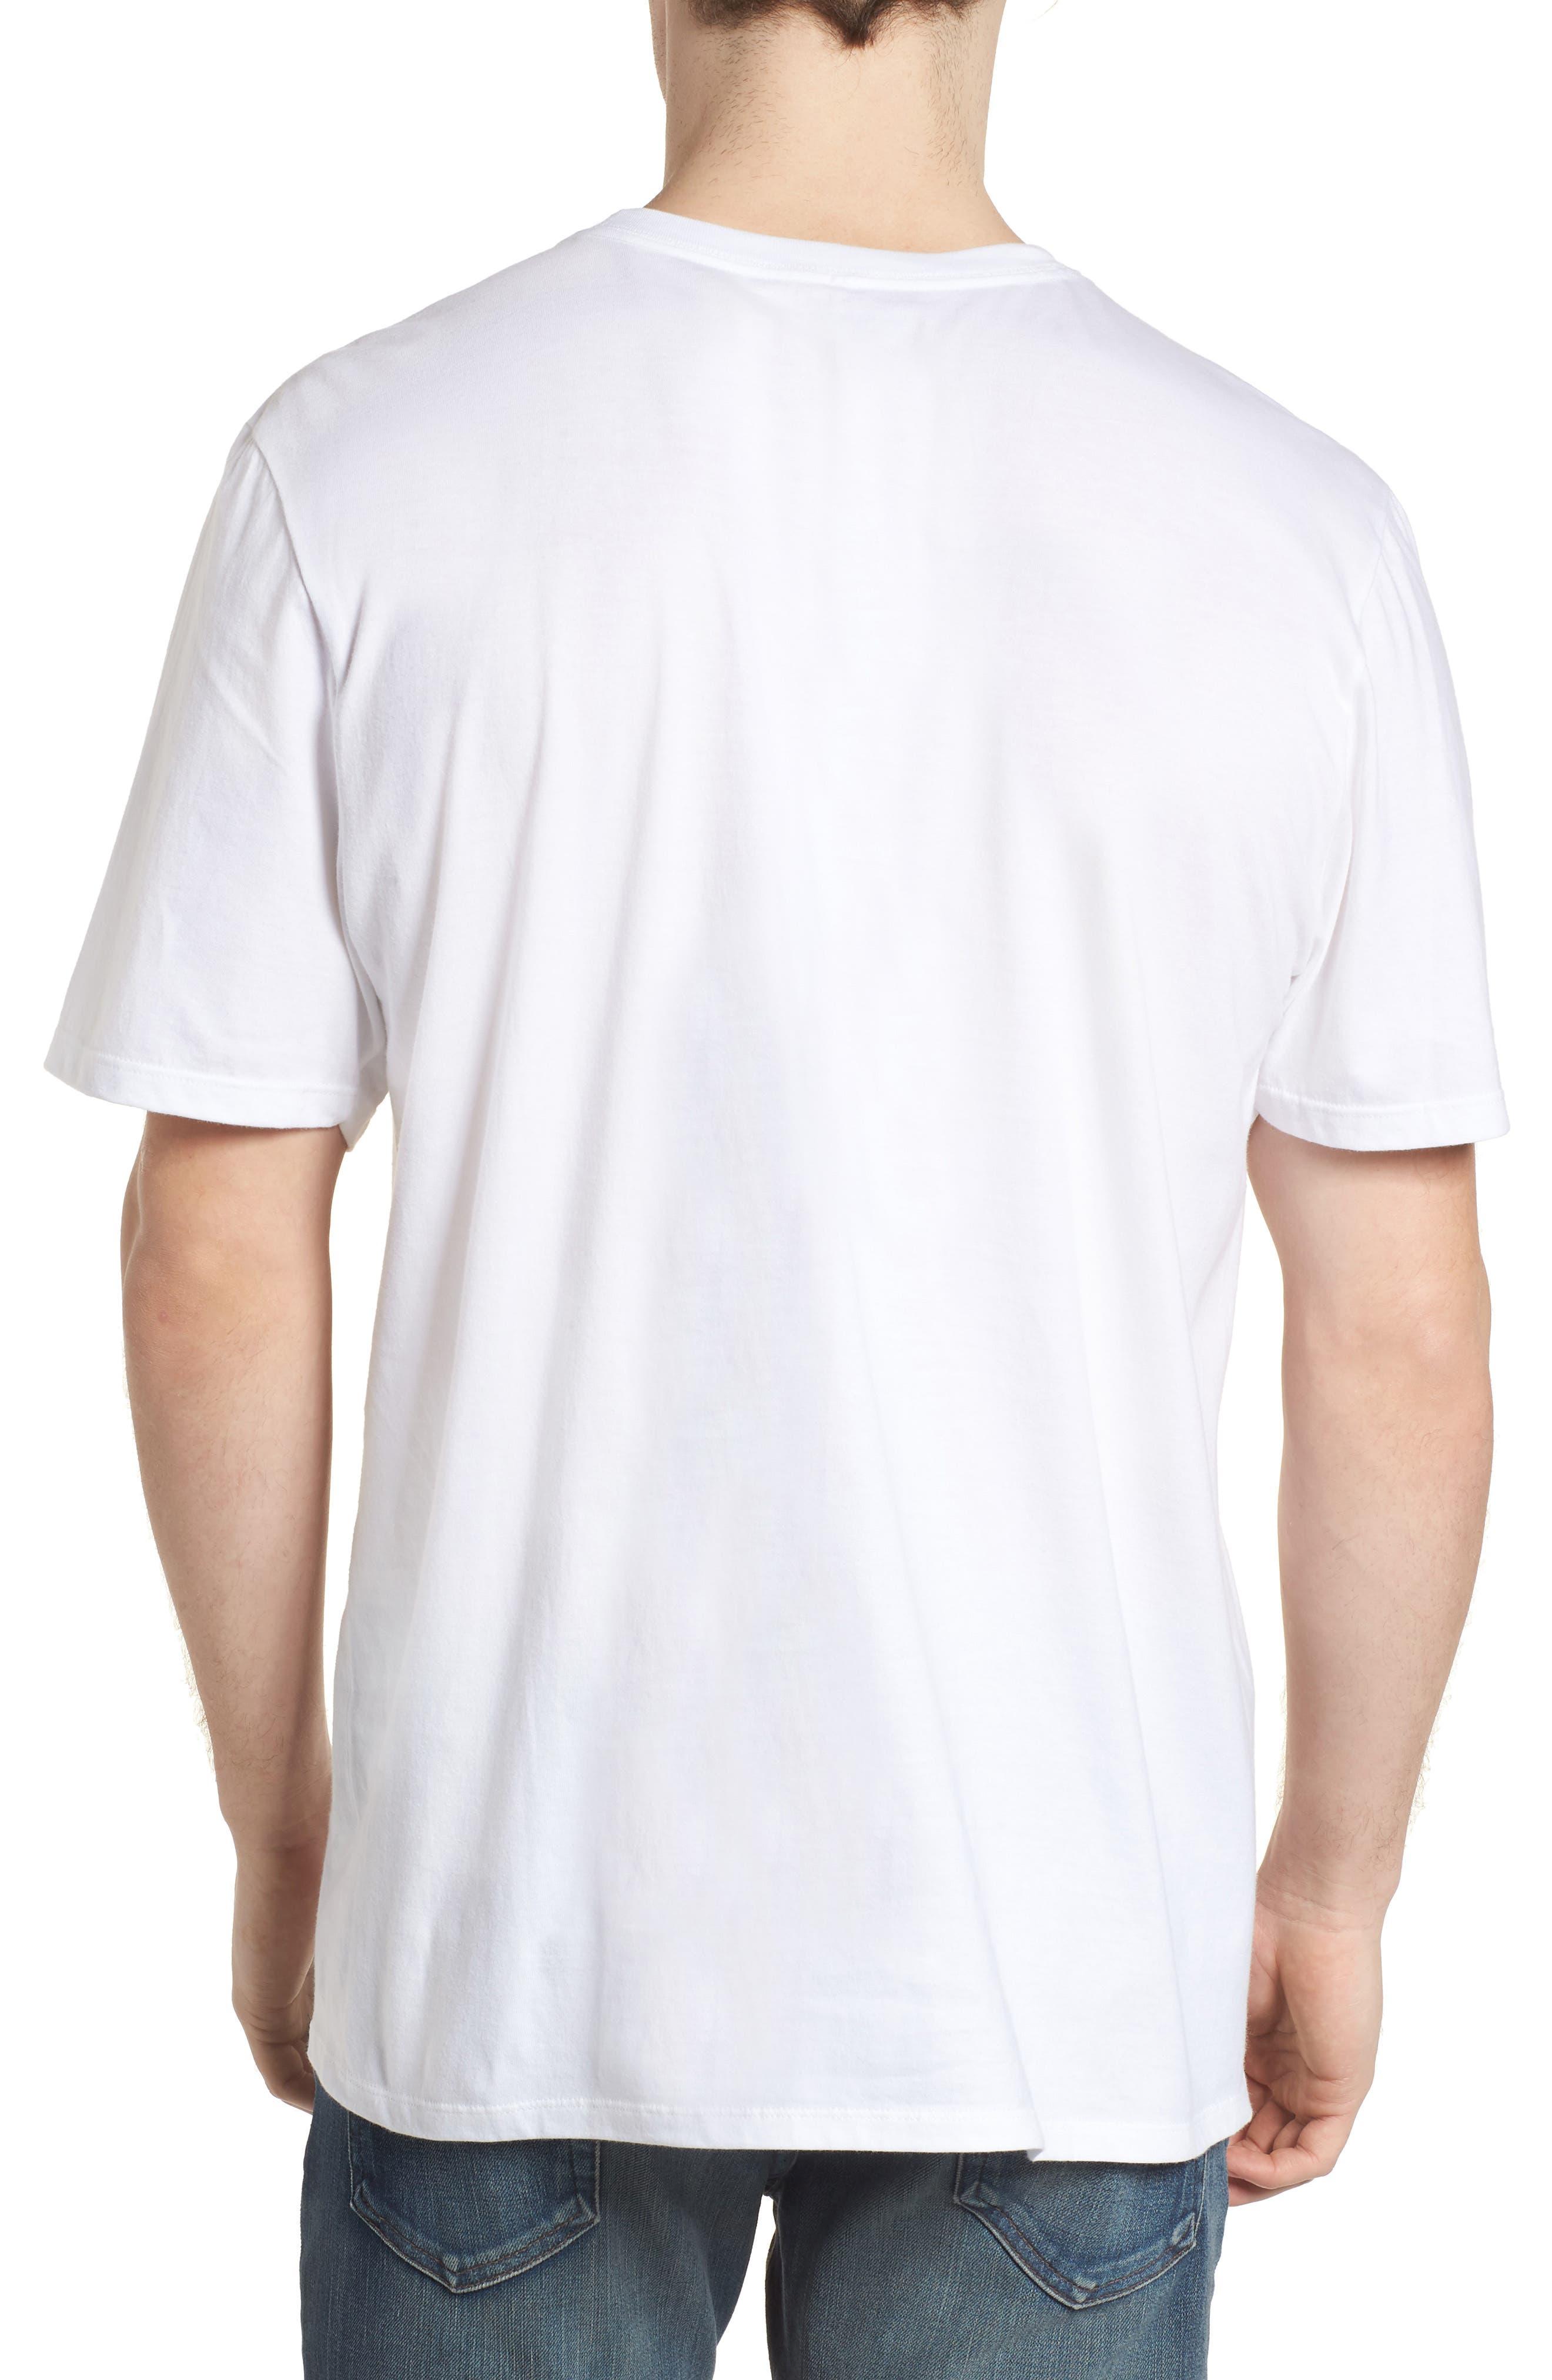 Hula T-Shirt,                             Alternate thumbnail 2, color,